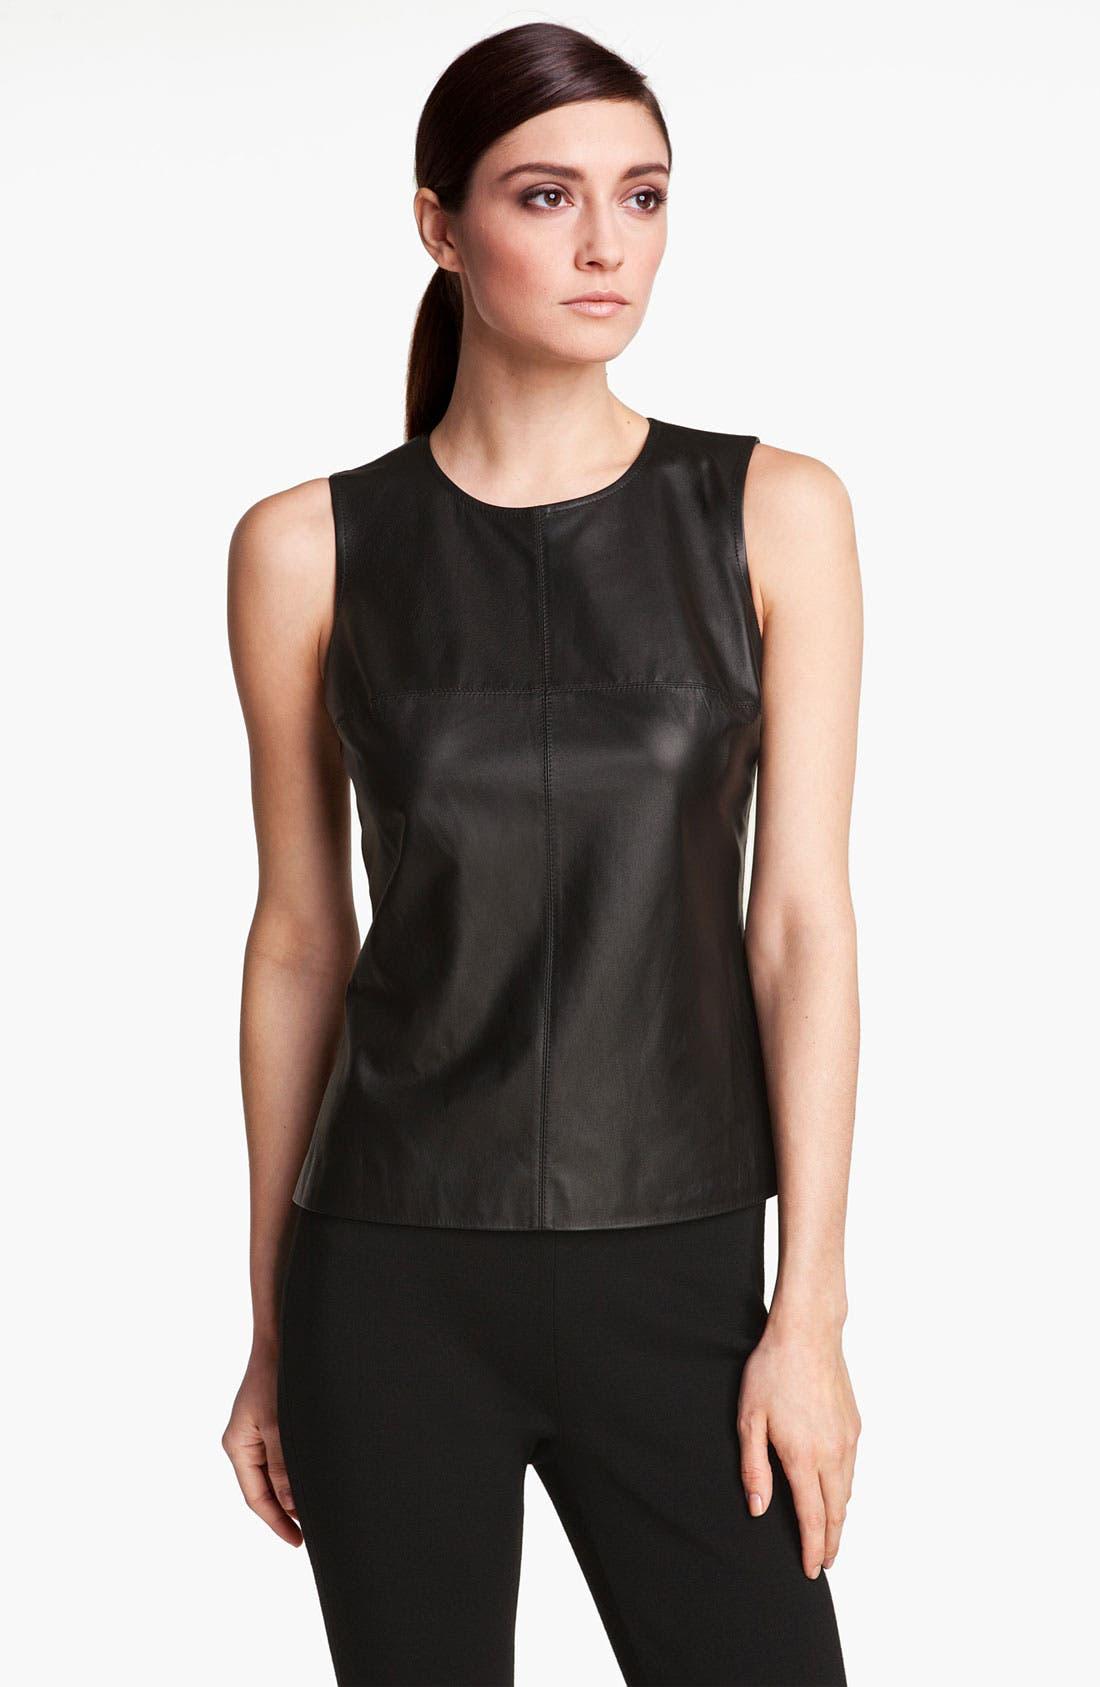 Main Image - St. John Collection Nappa Leather & Milano Knit Shell